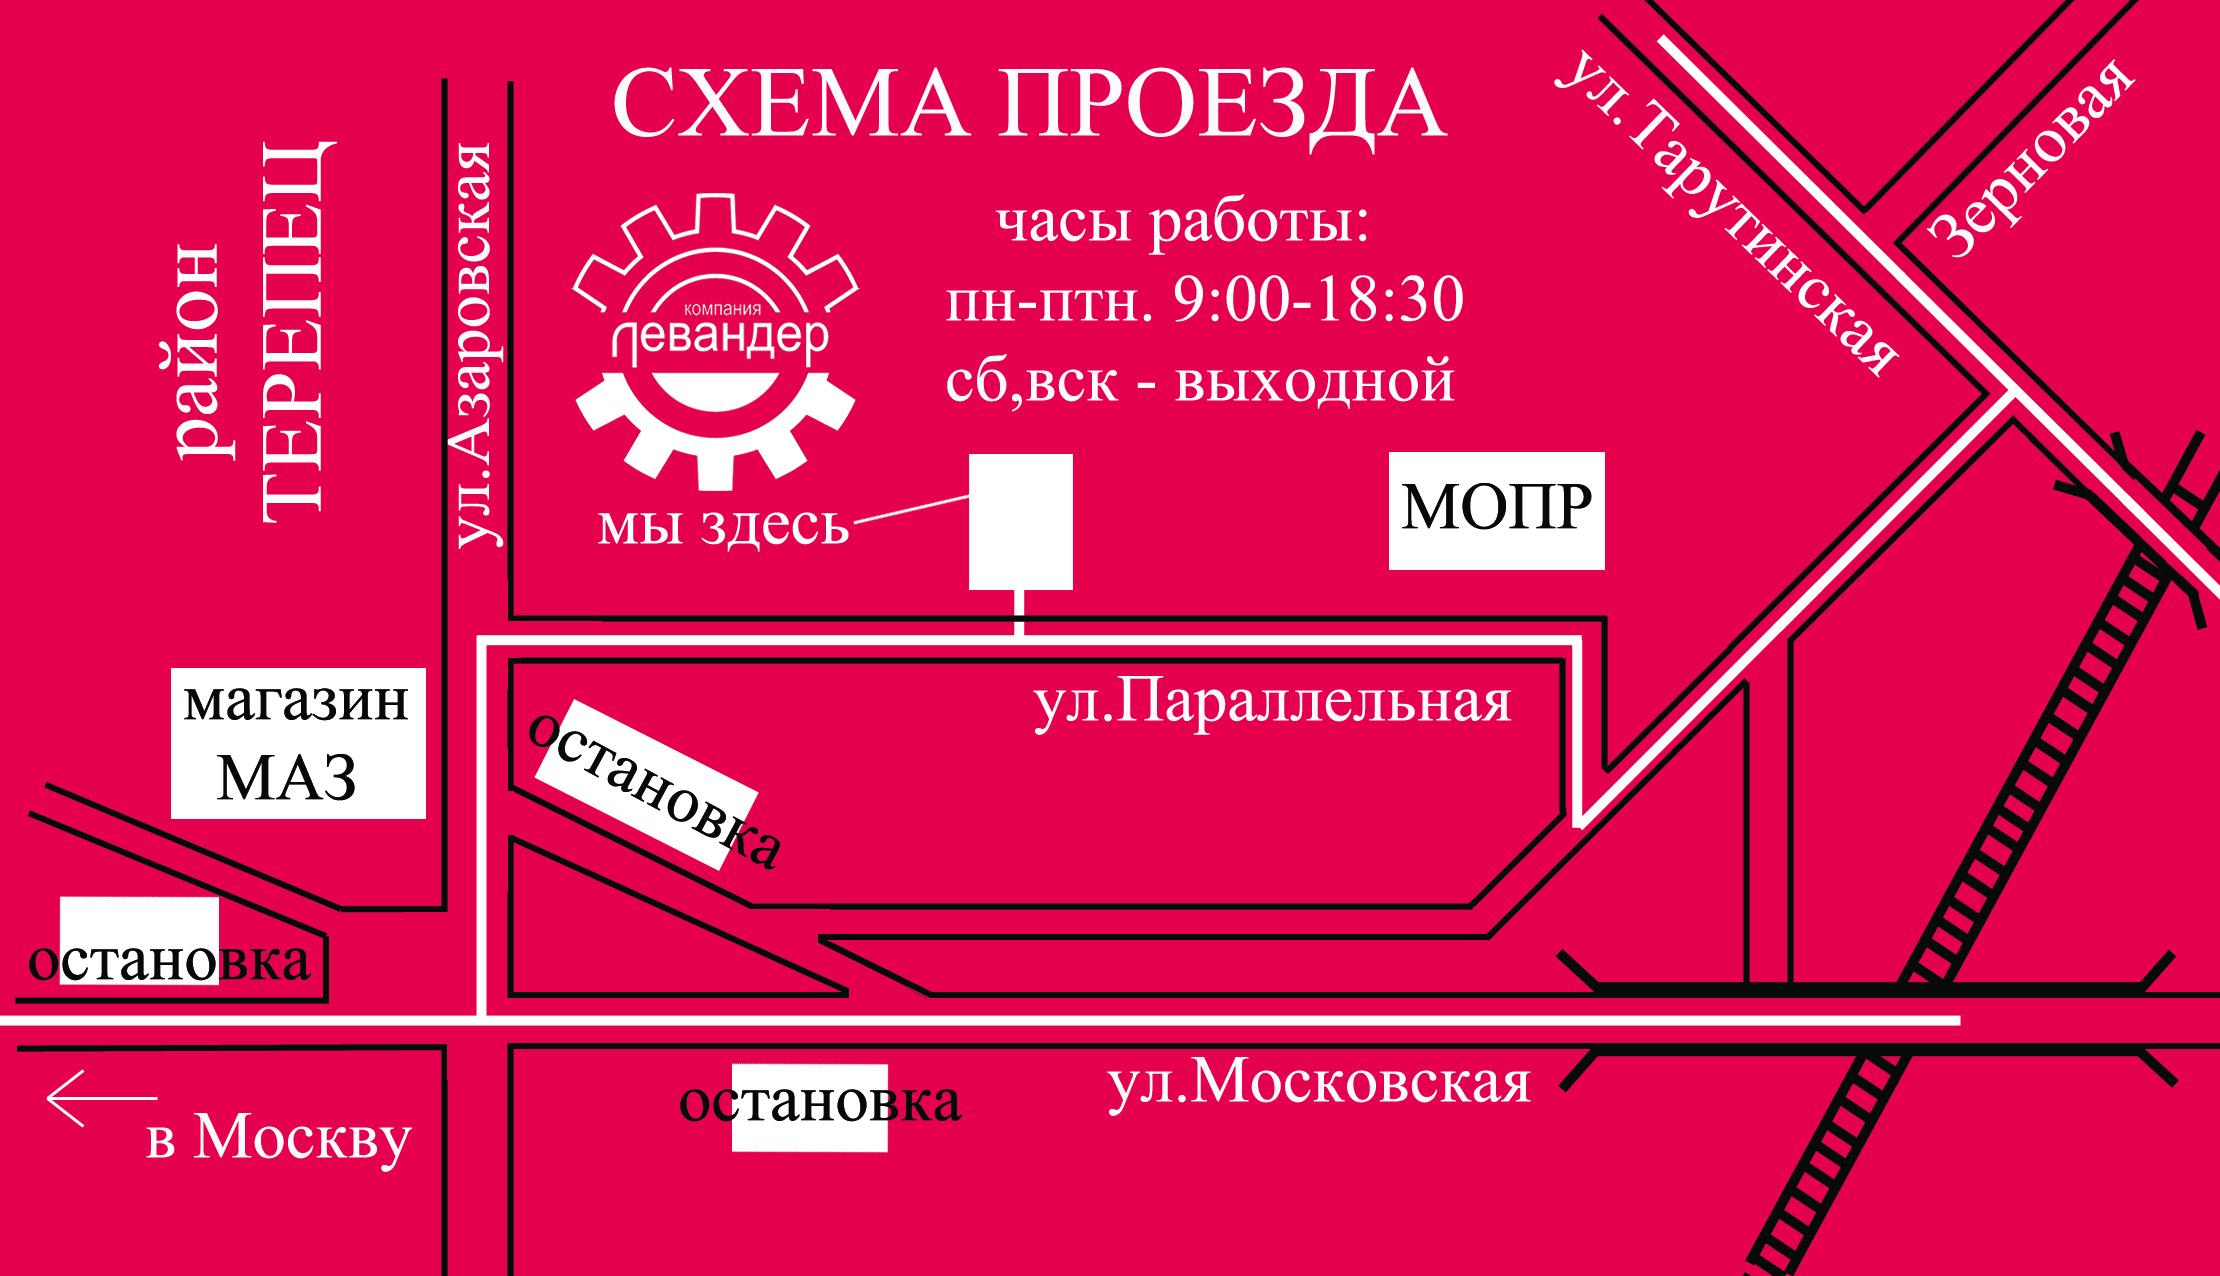 "Схема проезда к автомагазину и грузовому автосервису ""Компании ЛЕВАНДЕР"" в Калуге"